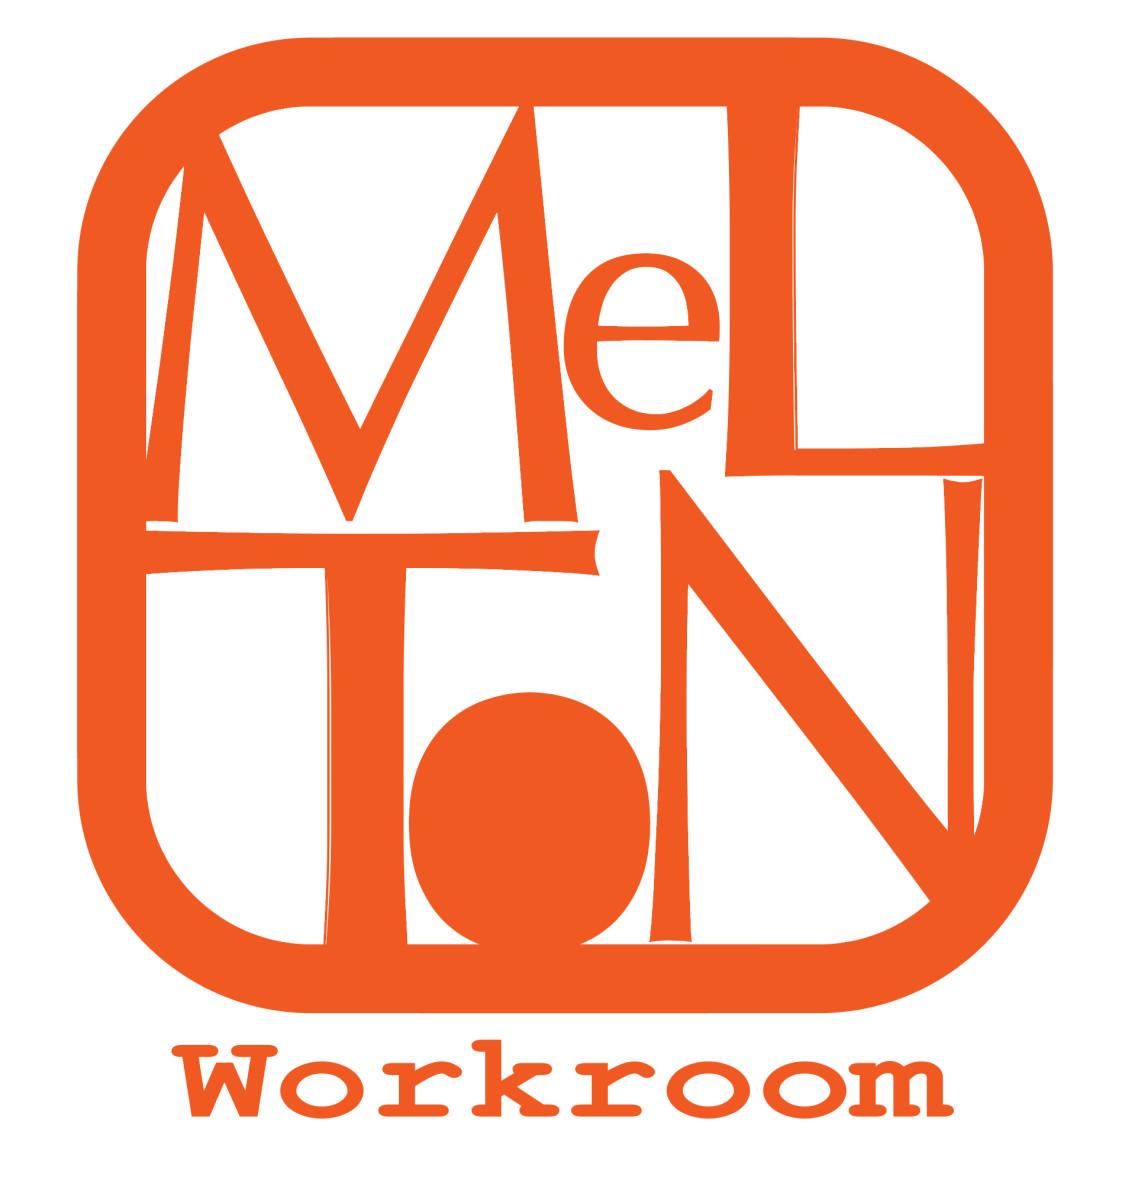 Melton Workroom logo